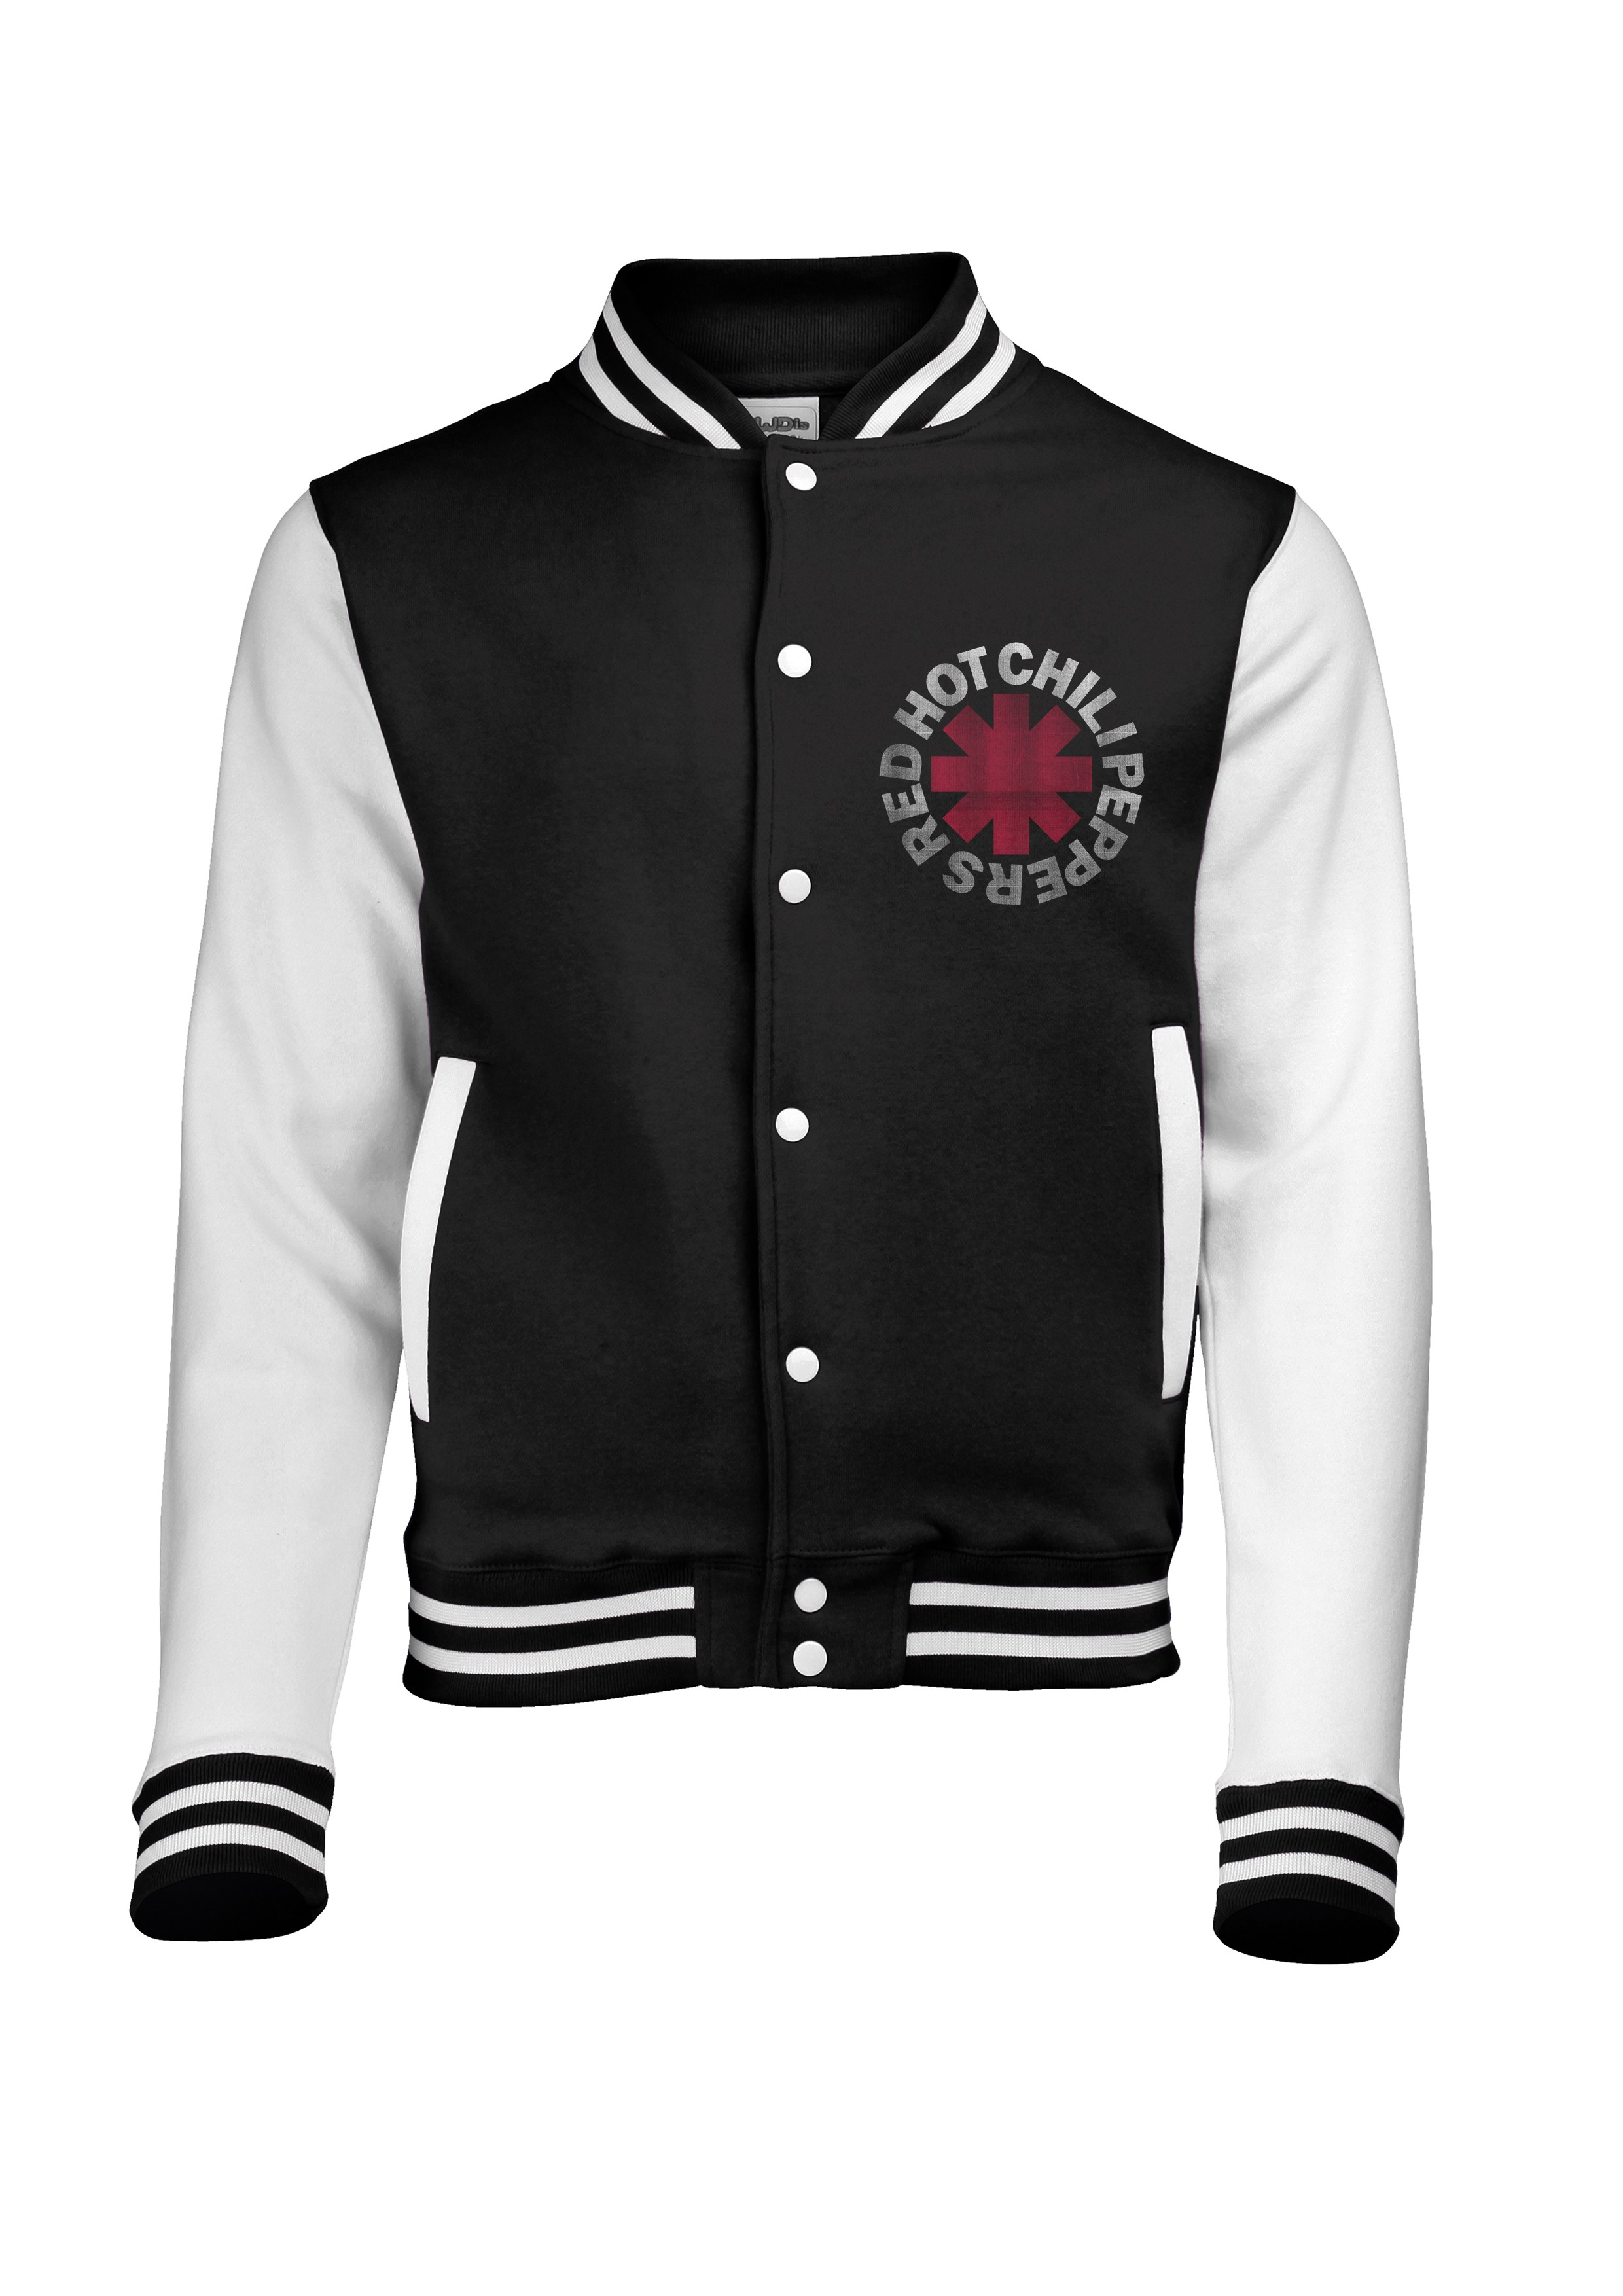 Xerox -  Black/White Varsity Jacket - Red Hot Chili Peppers